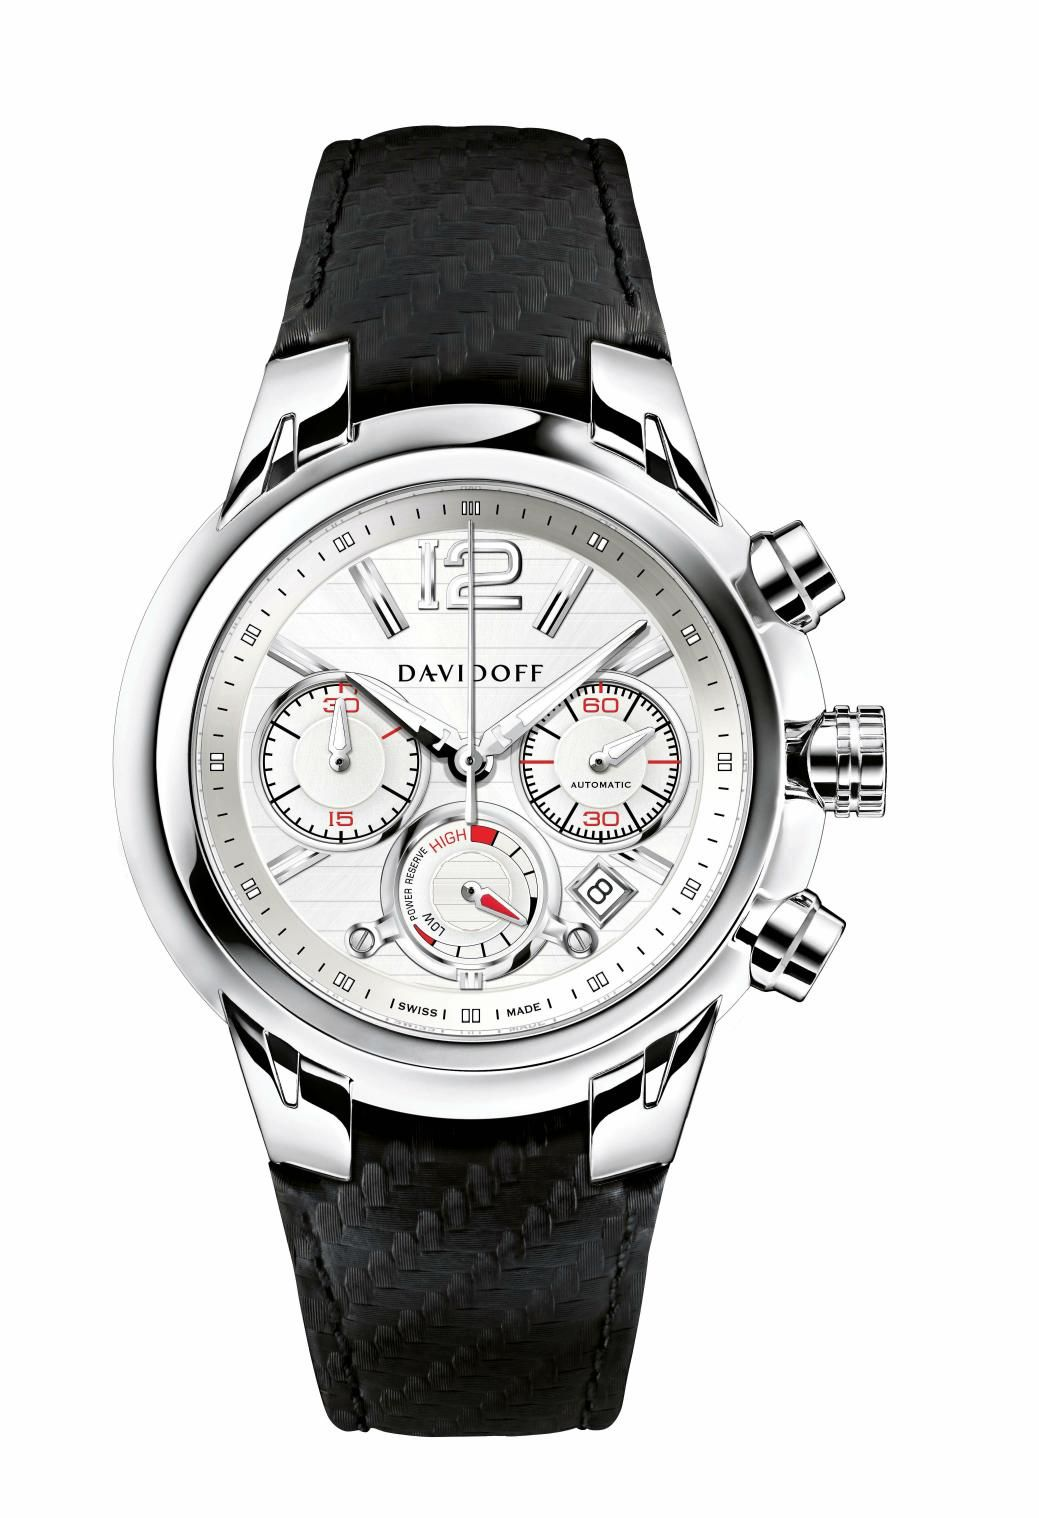 Davidoff - Velero Power Reserve Chronograph watch